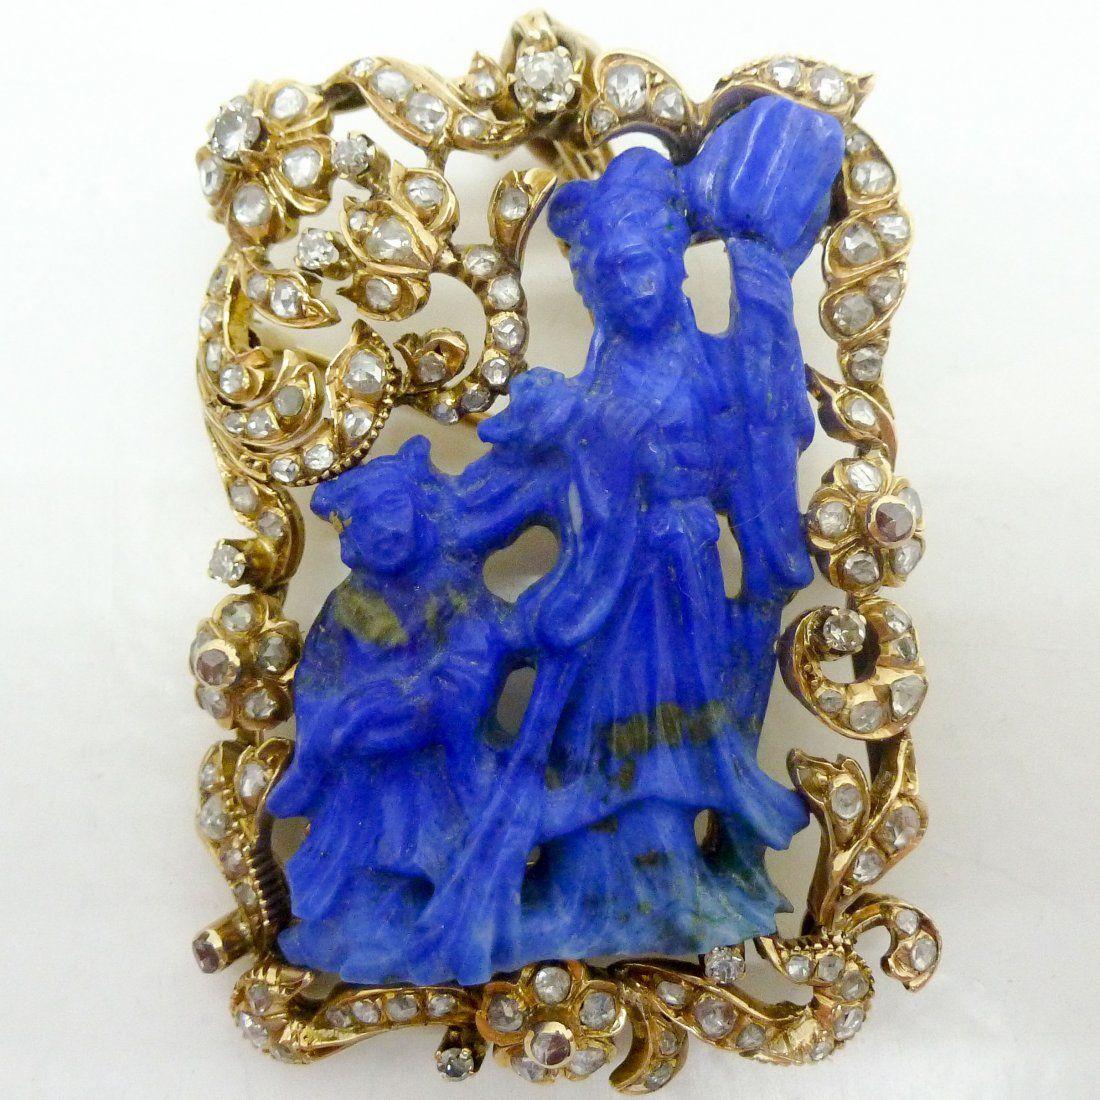 A Fine Carved Lapis Lazuli Brooch with Diamonds 14KG